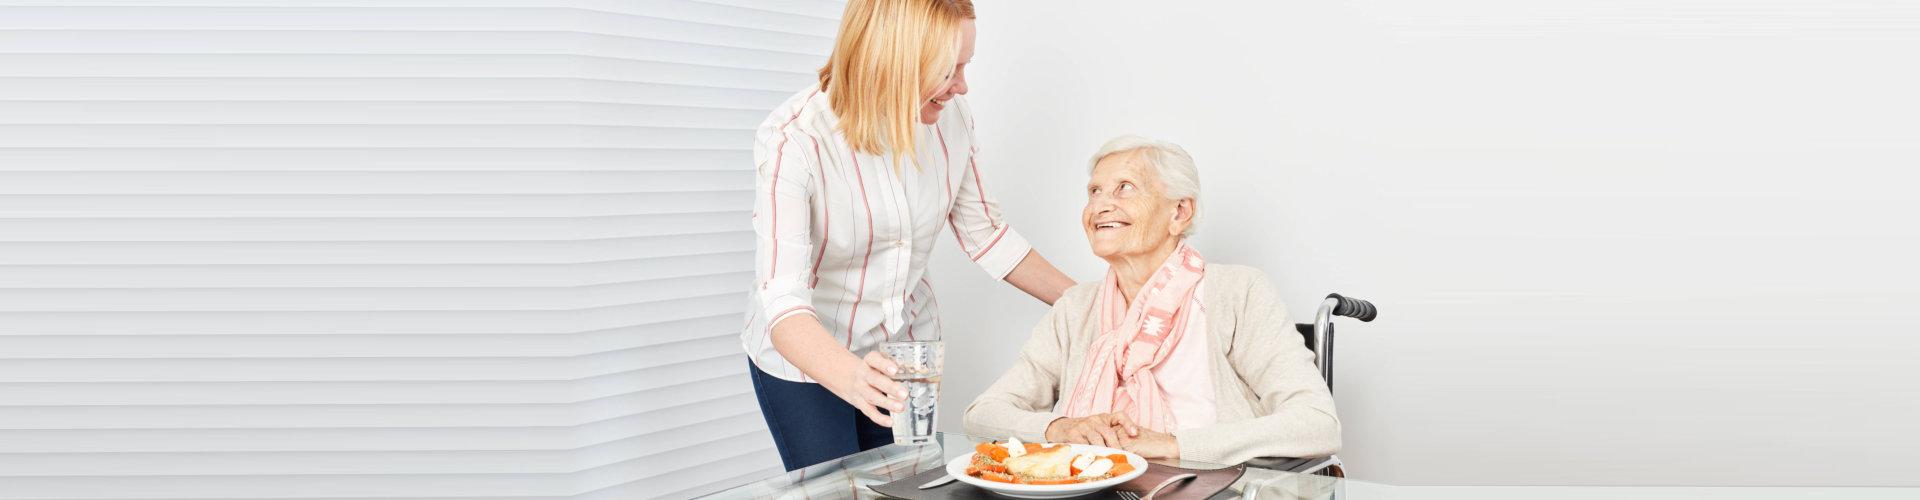 caregiver and elderly having a meals